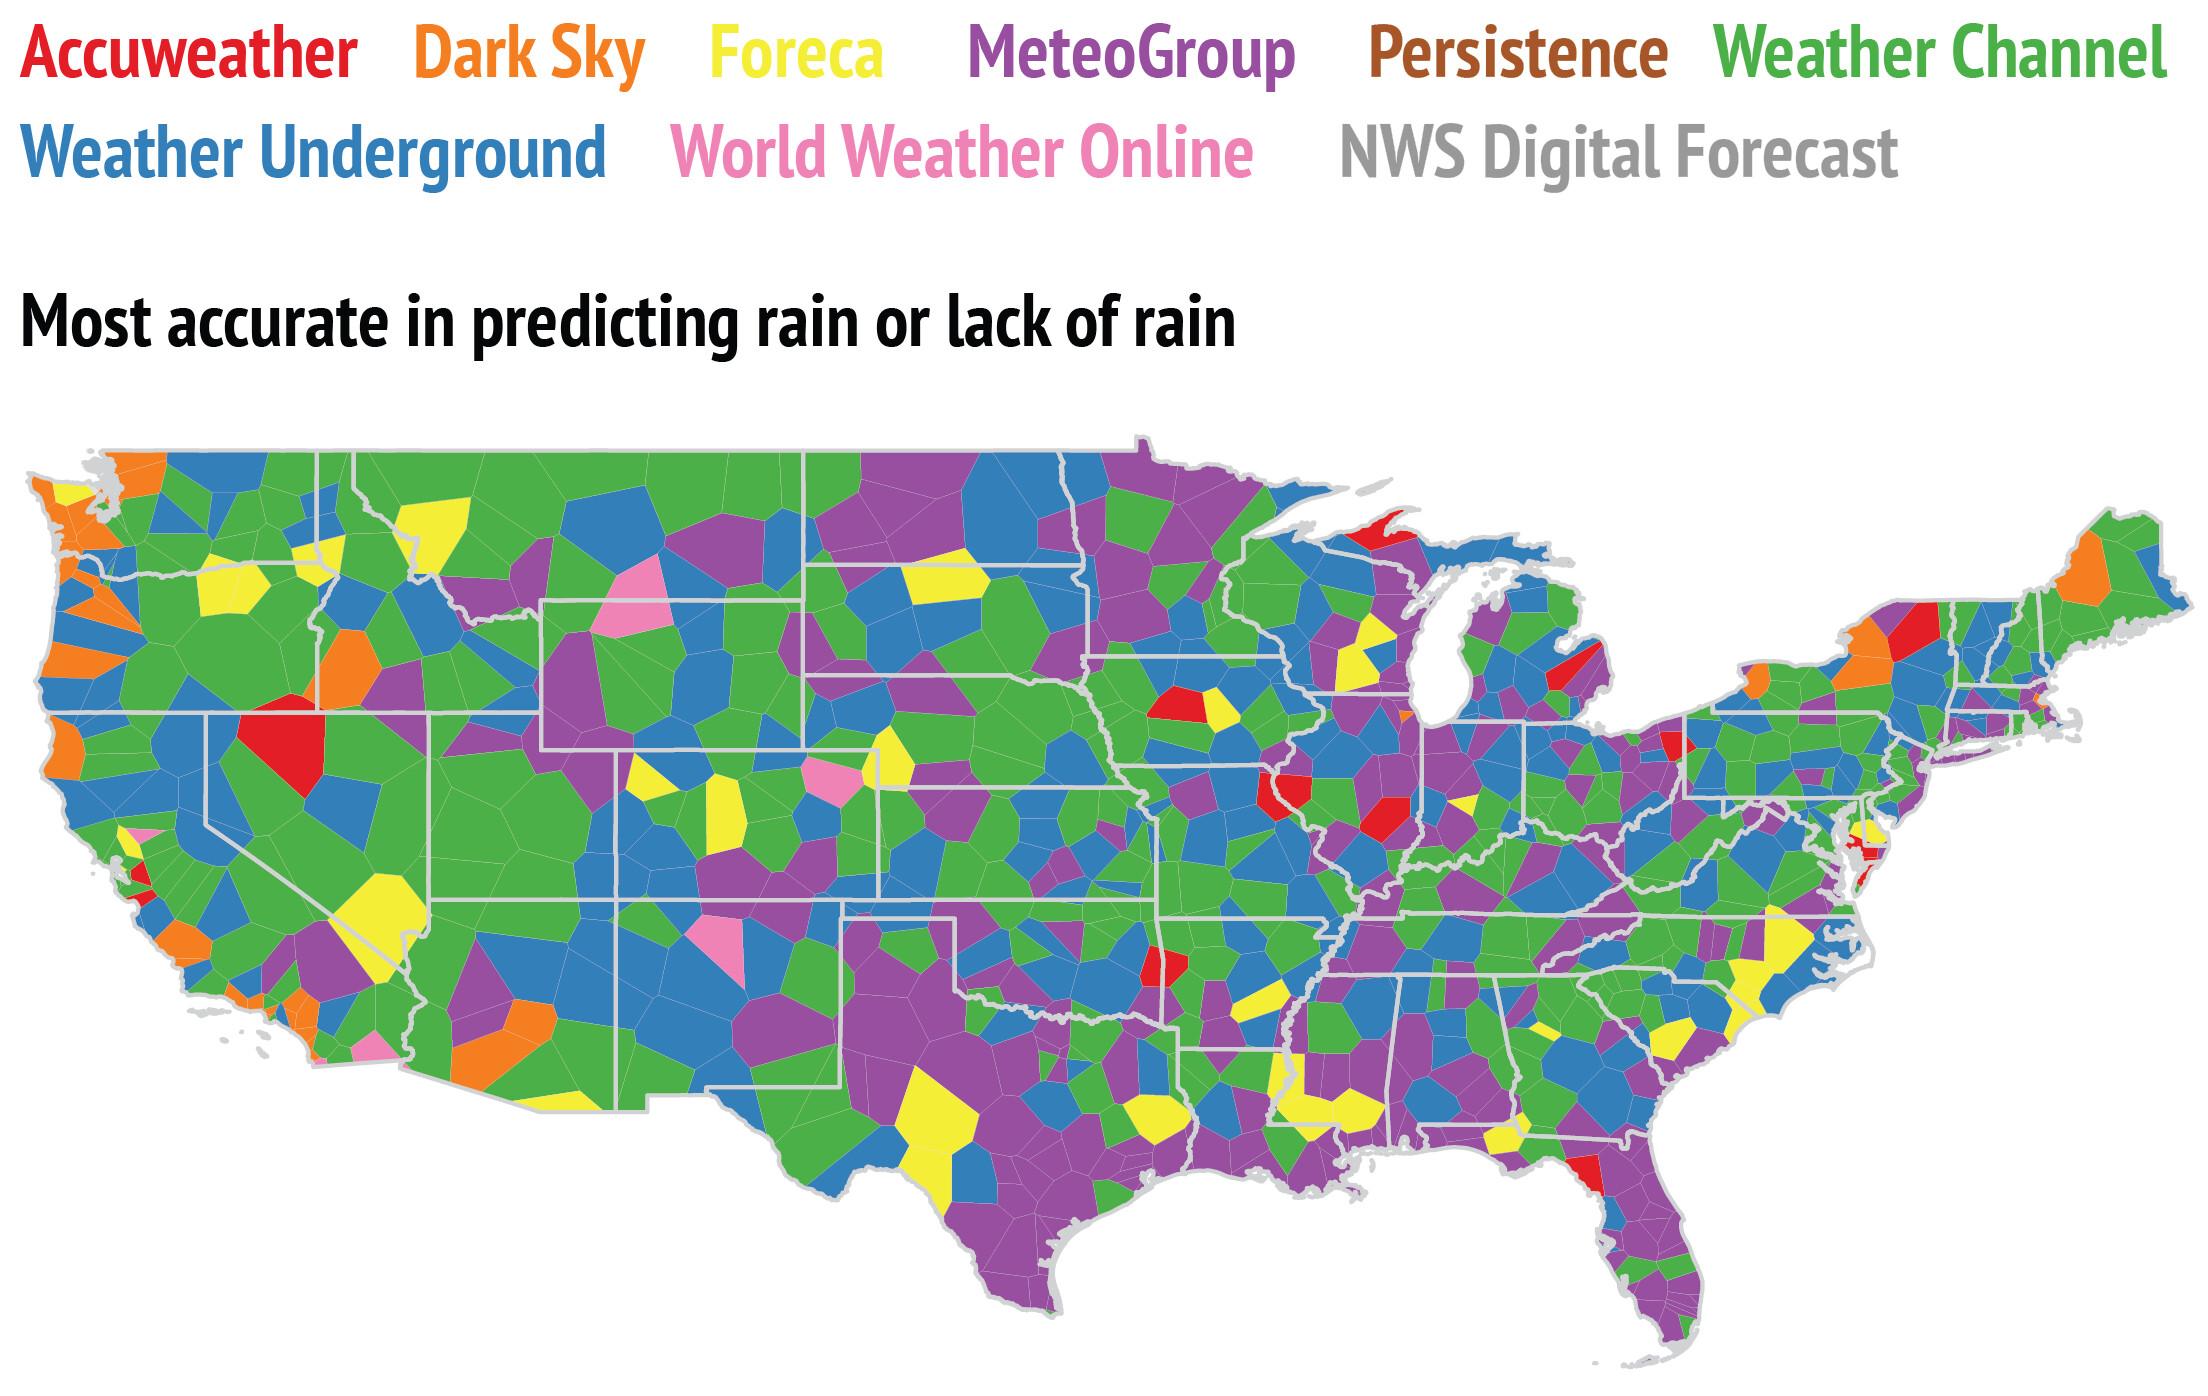 Source ForecastAdvisor